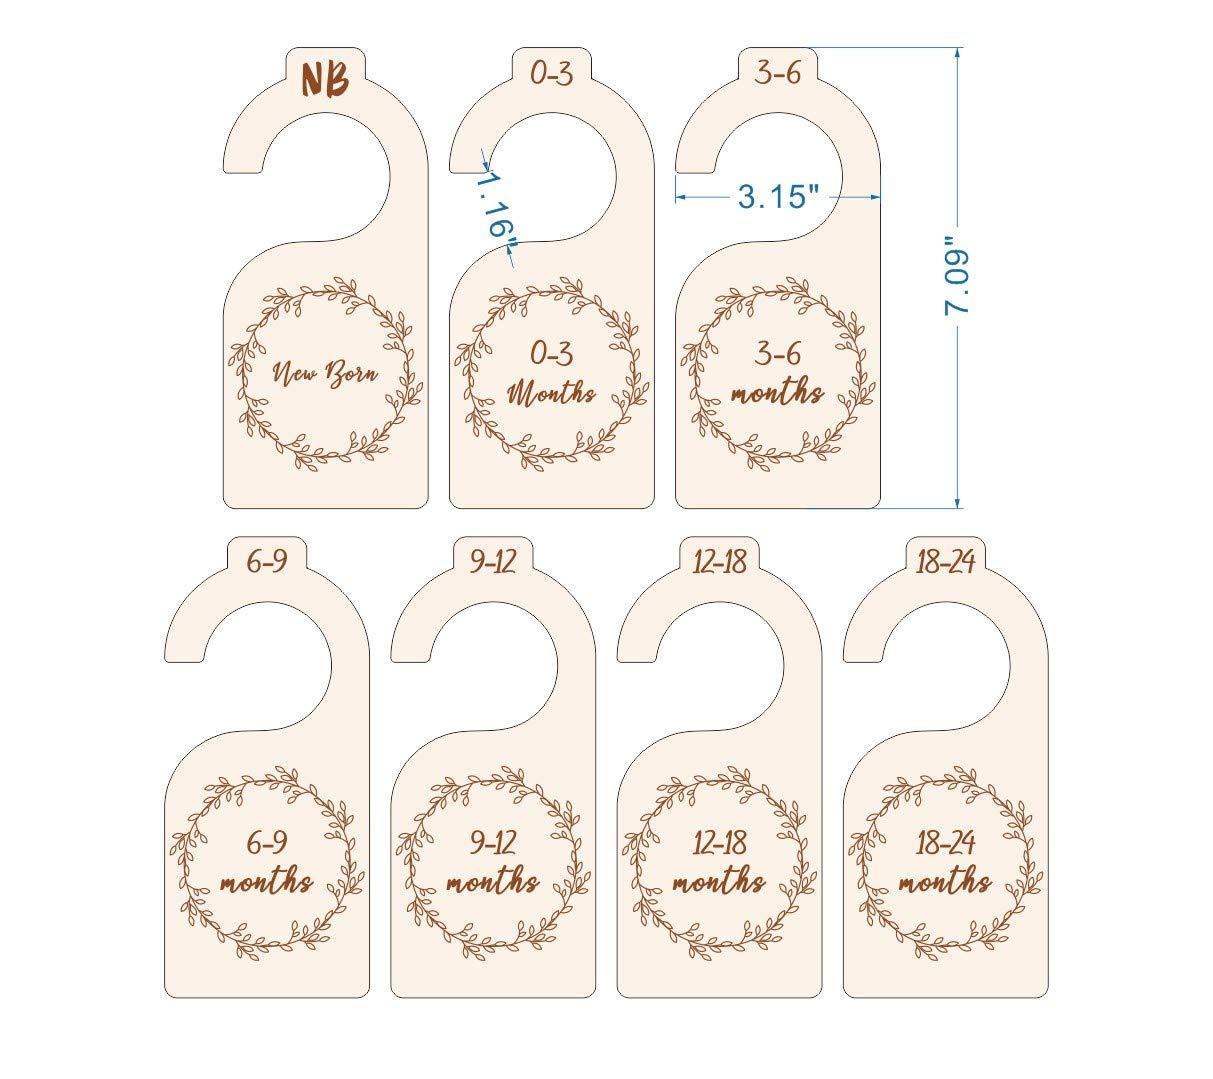 Newborn to 24 Months Baby Cloth Organizer by Age and Size Gender Neutral Nursery Infant Wardrobe Divider Baby Closet Divider Wooden